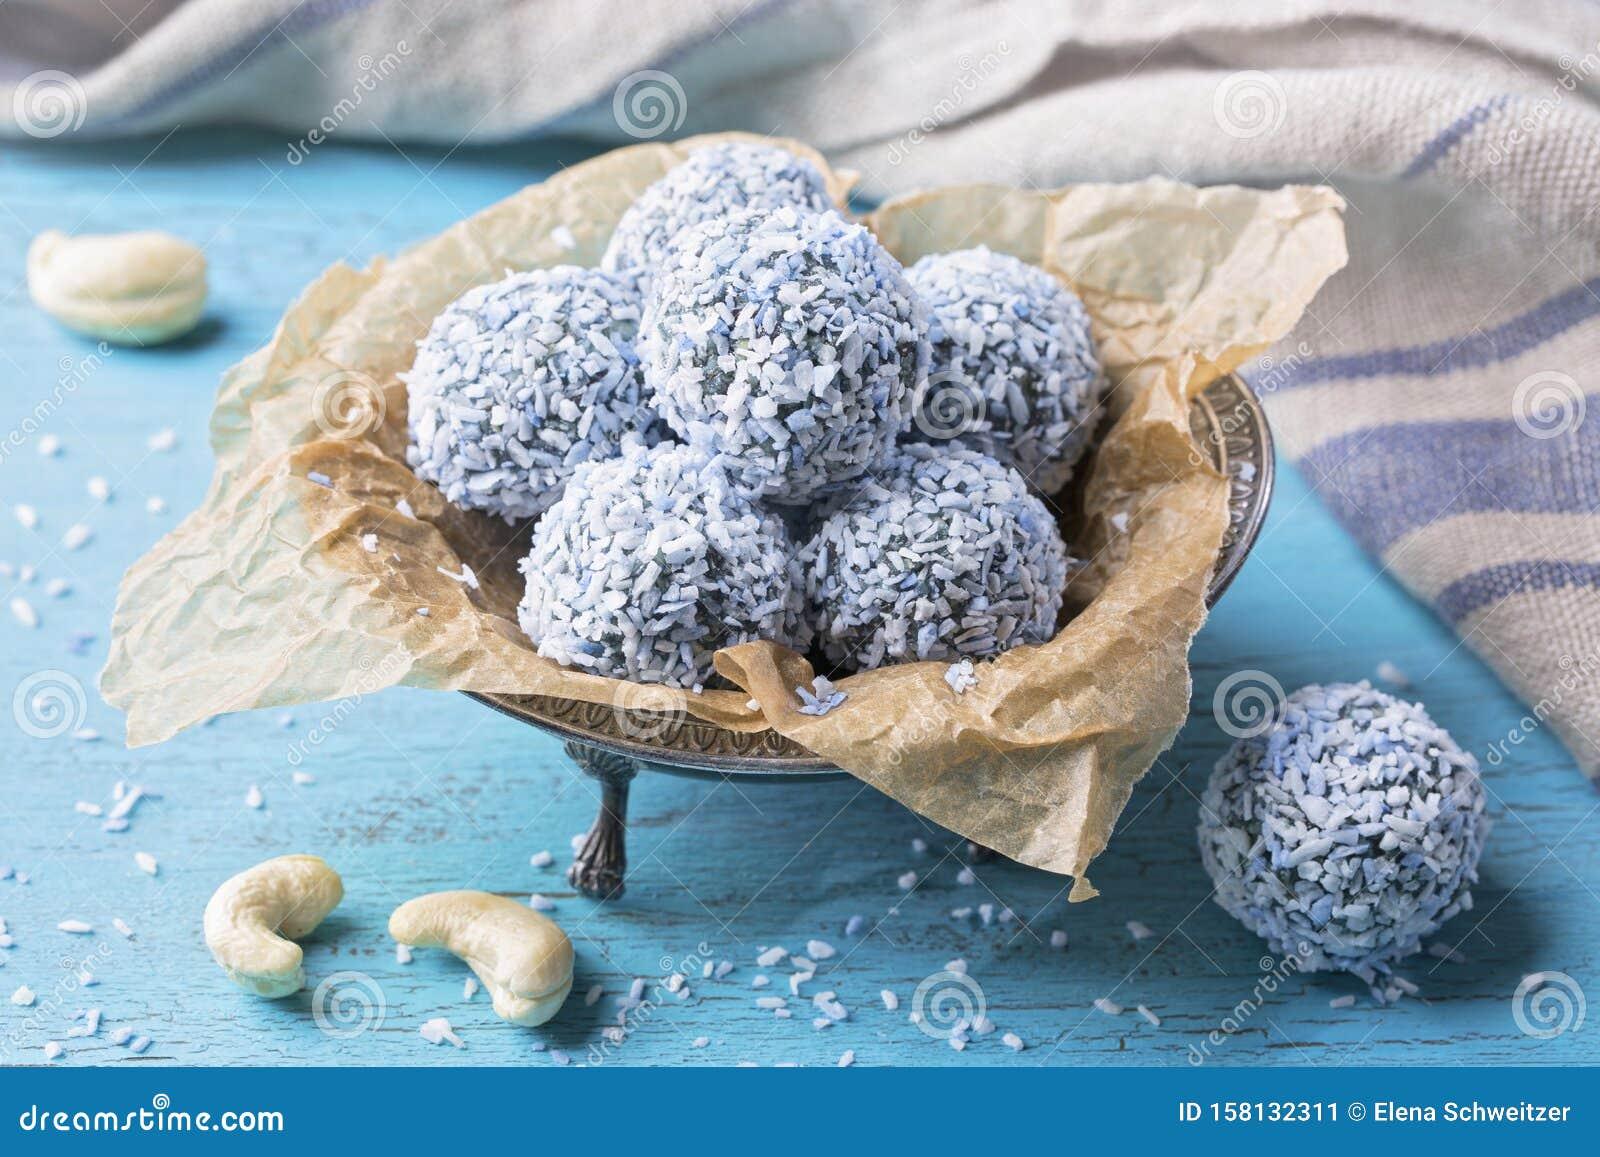 Energy balls with nuts, hemp hearts and blue spirulina